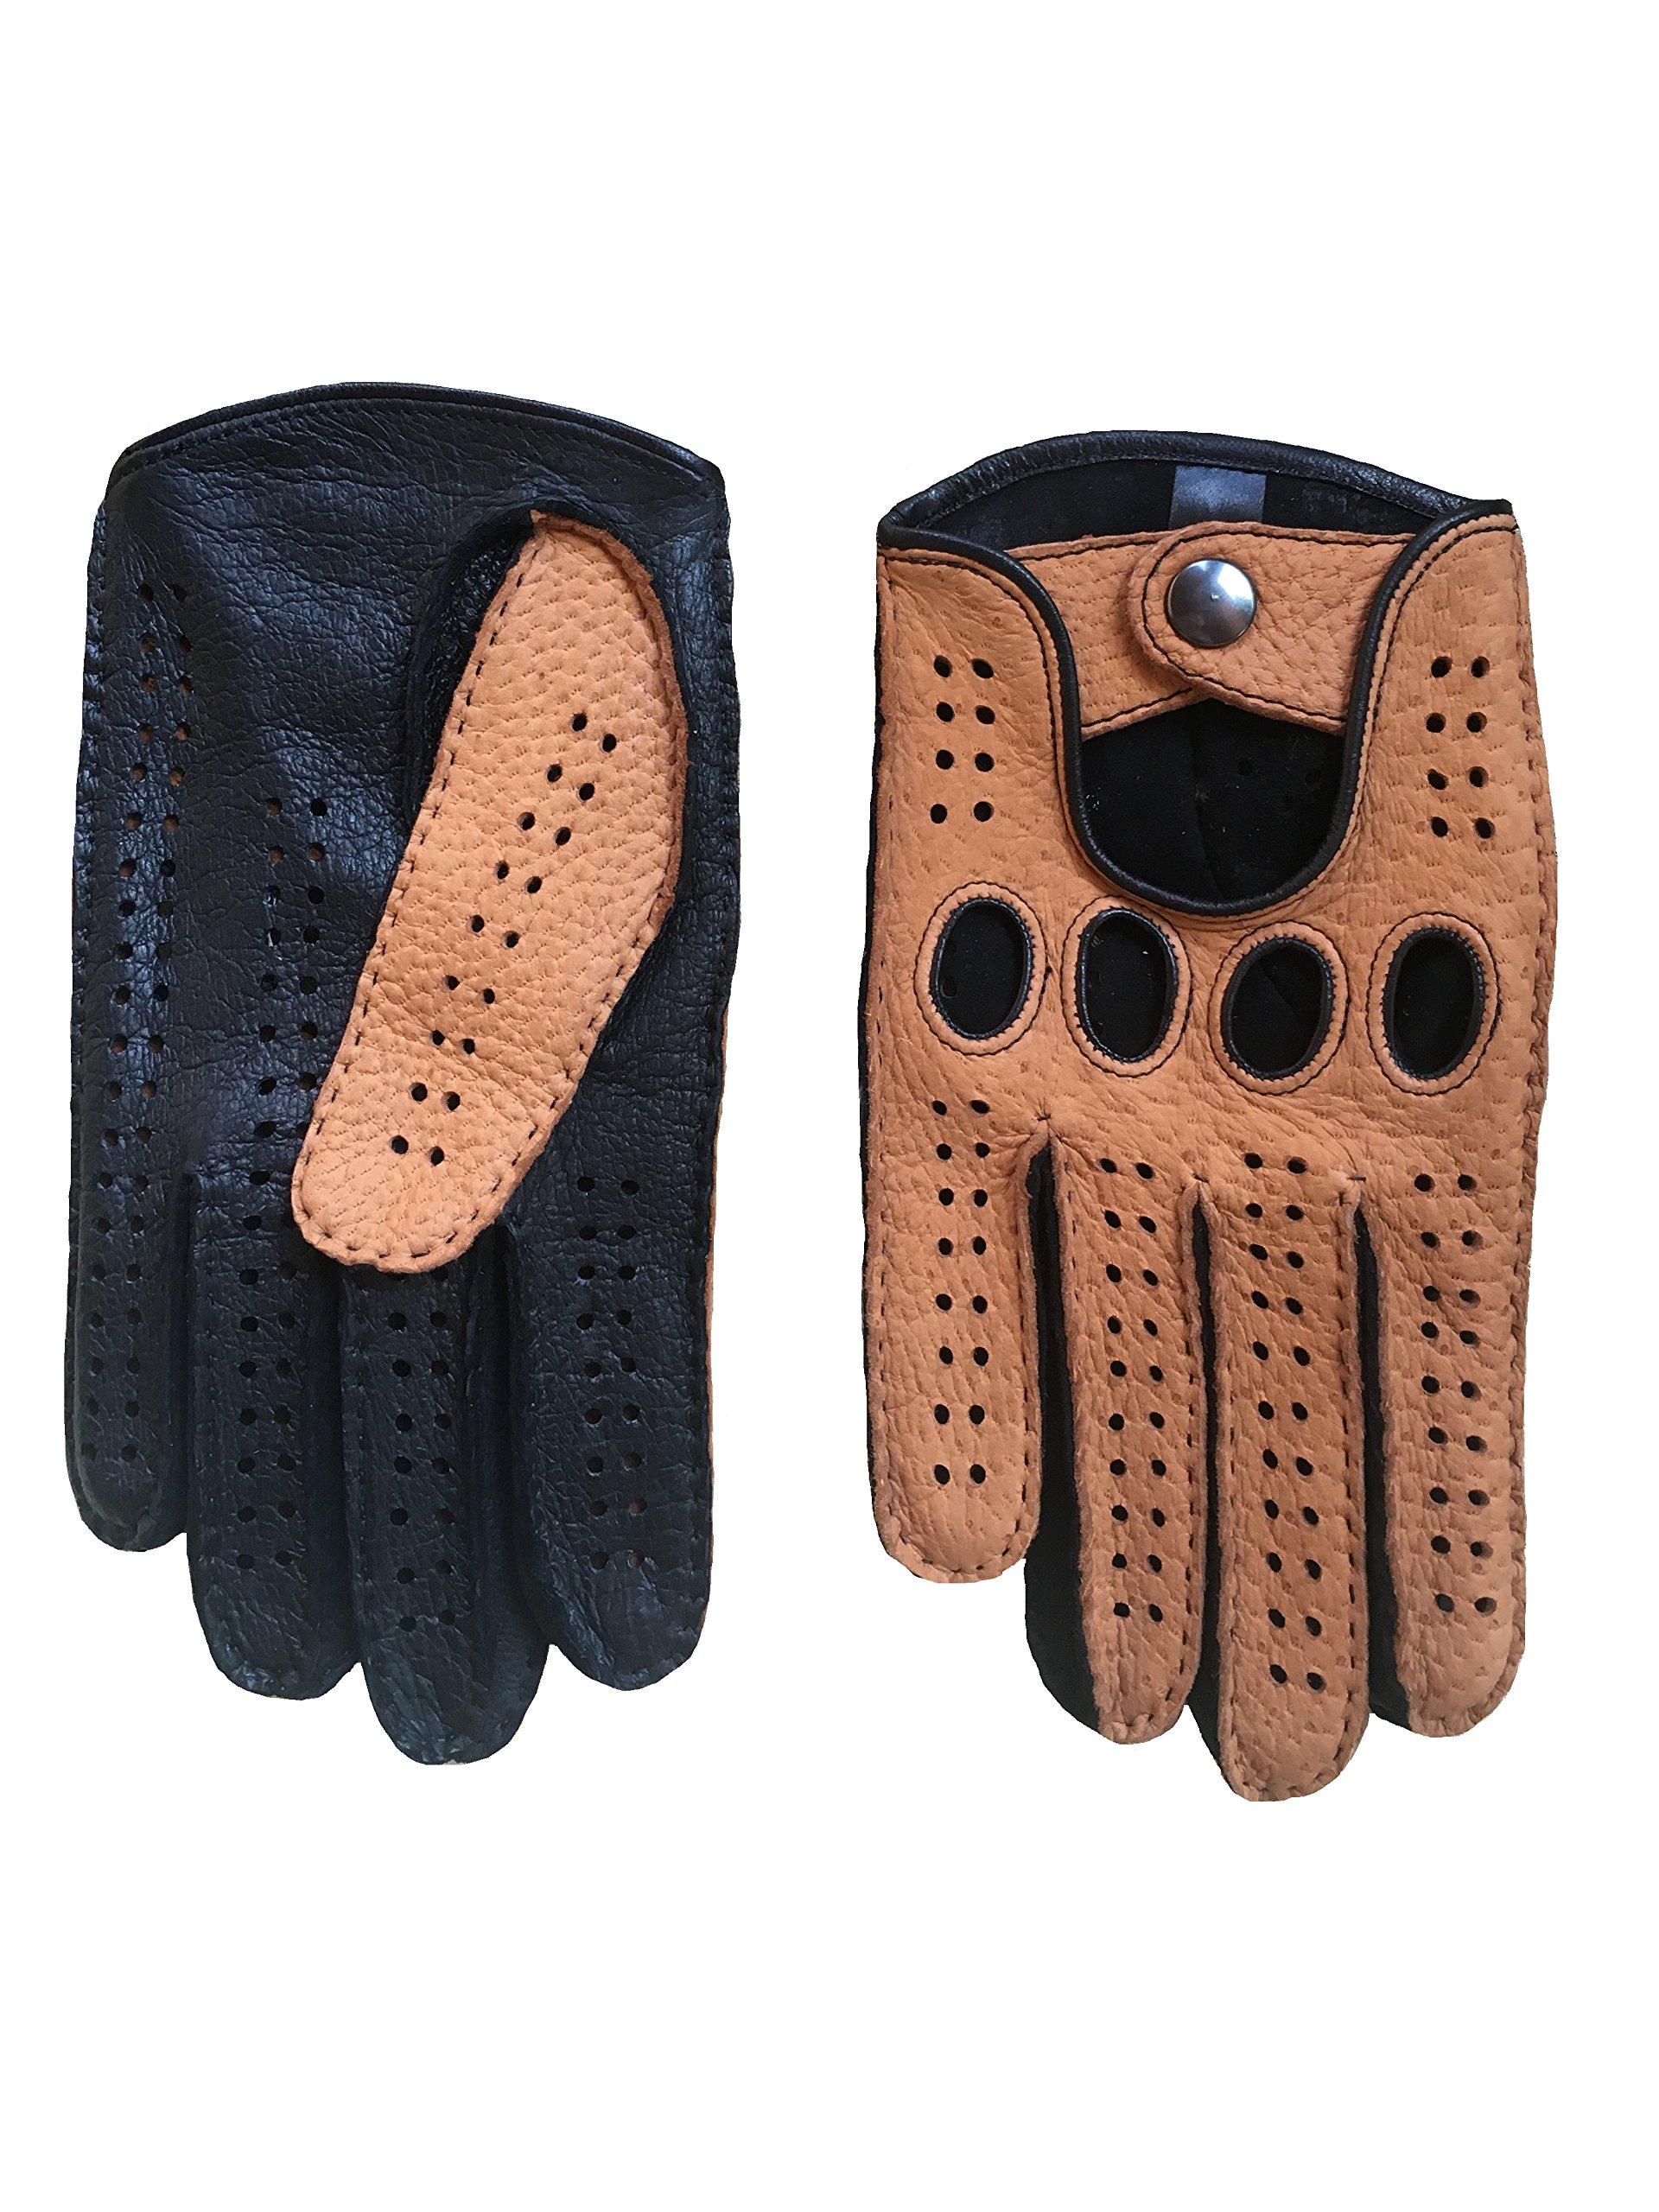 Men's Peccary Driving Gloves Color Black Cork by Hungant (8, Cork)